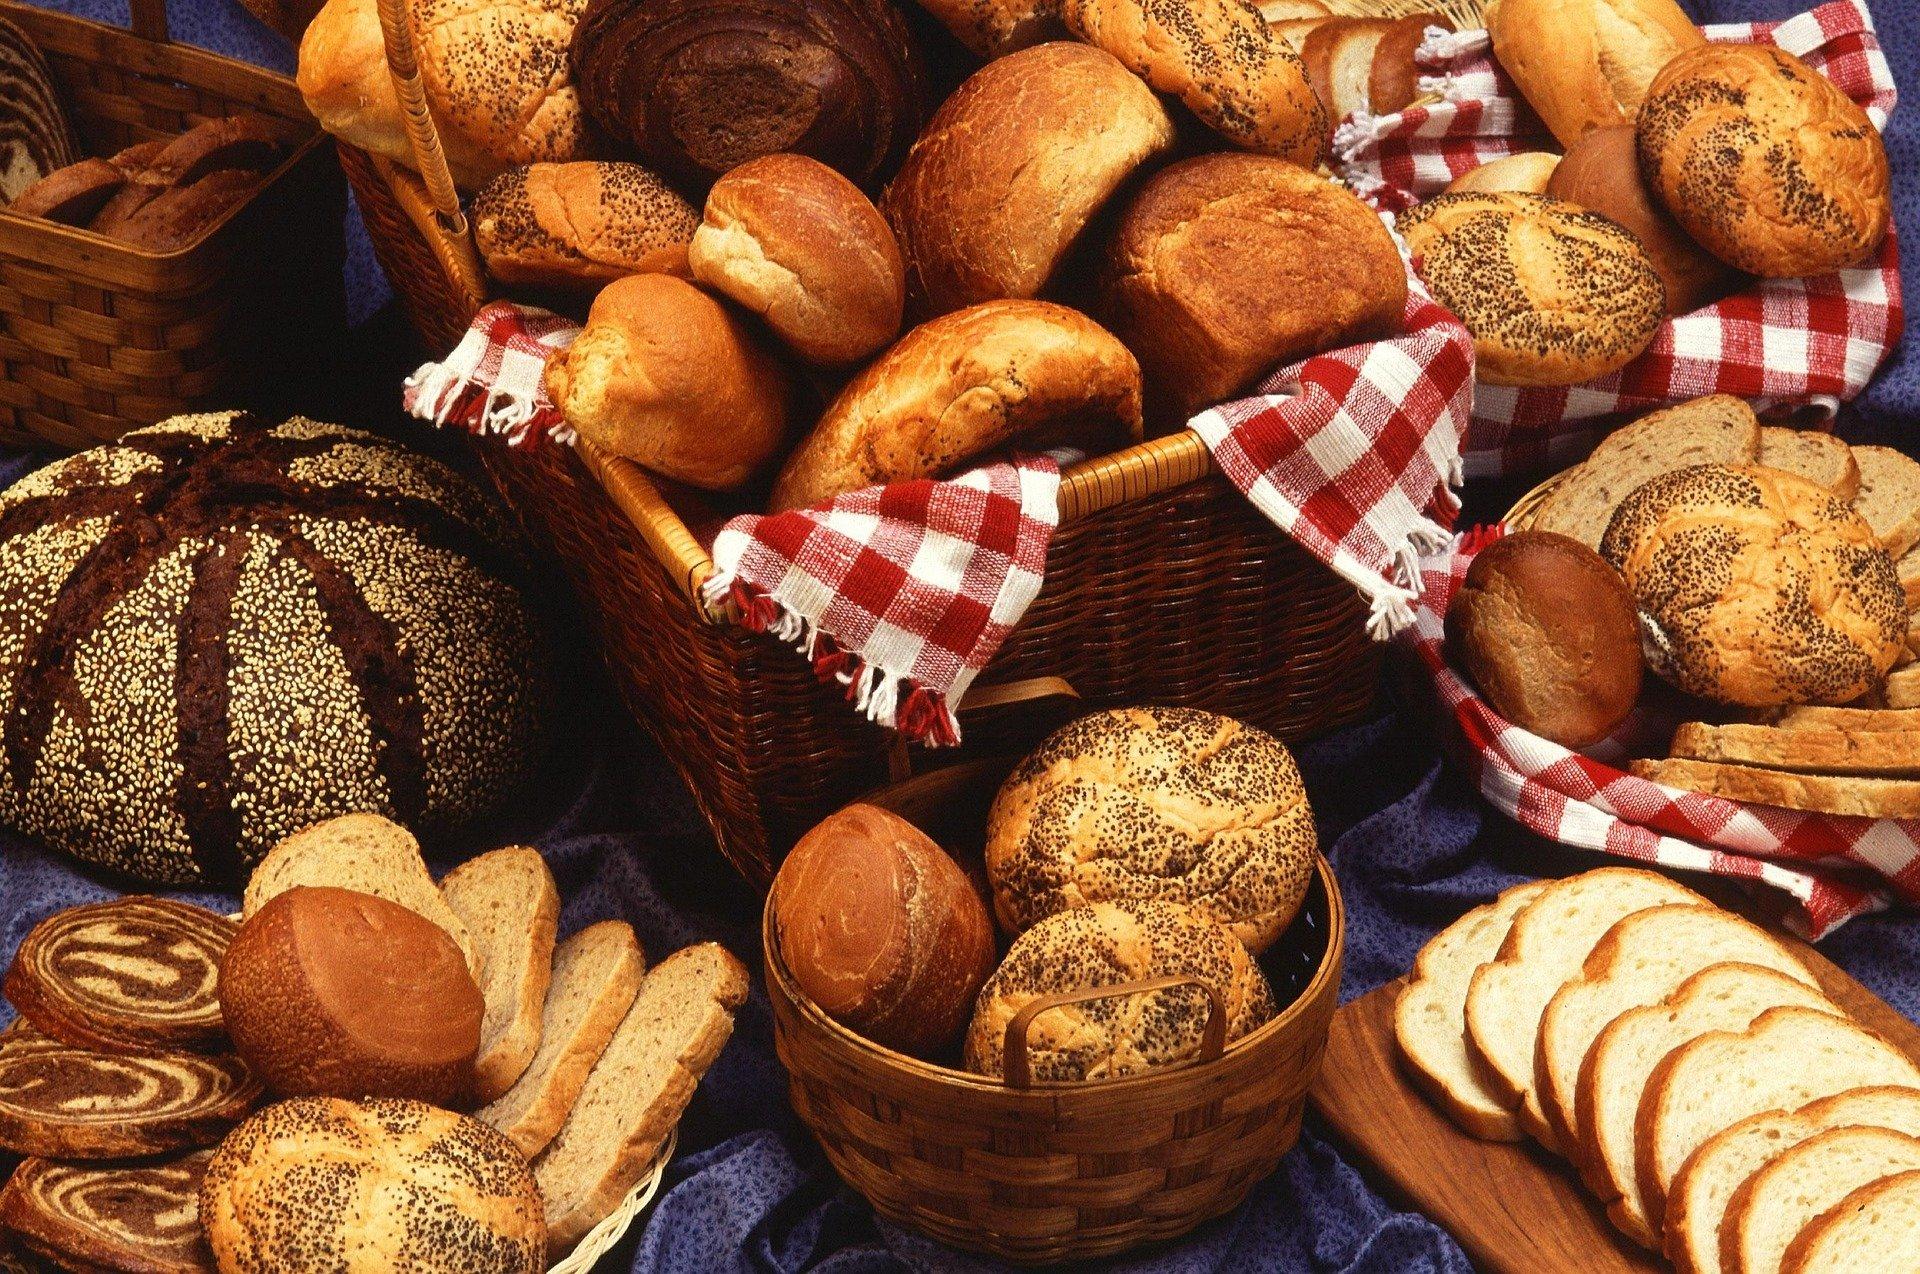 German Bread and Rolls